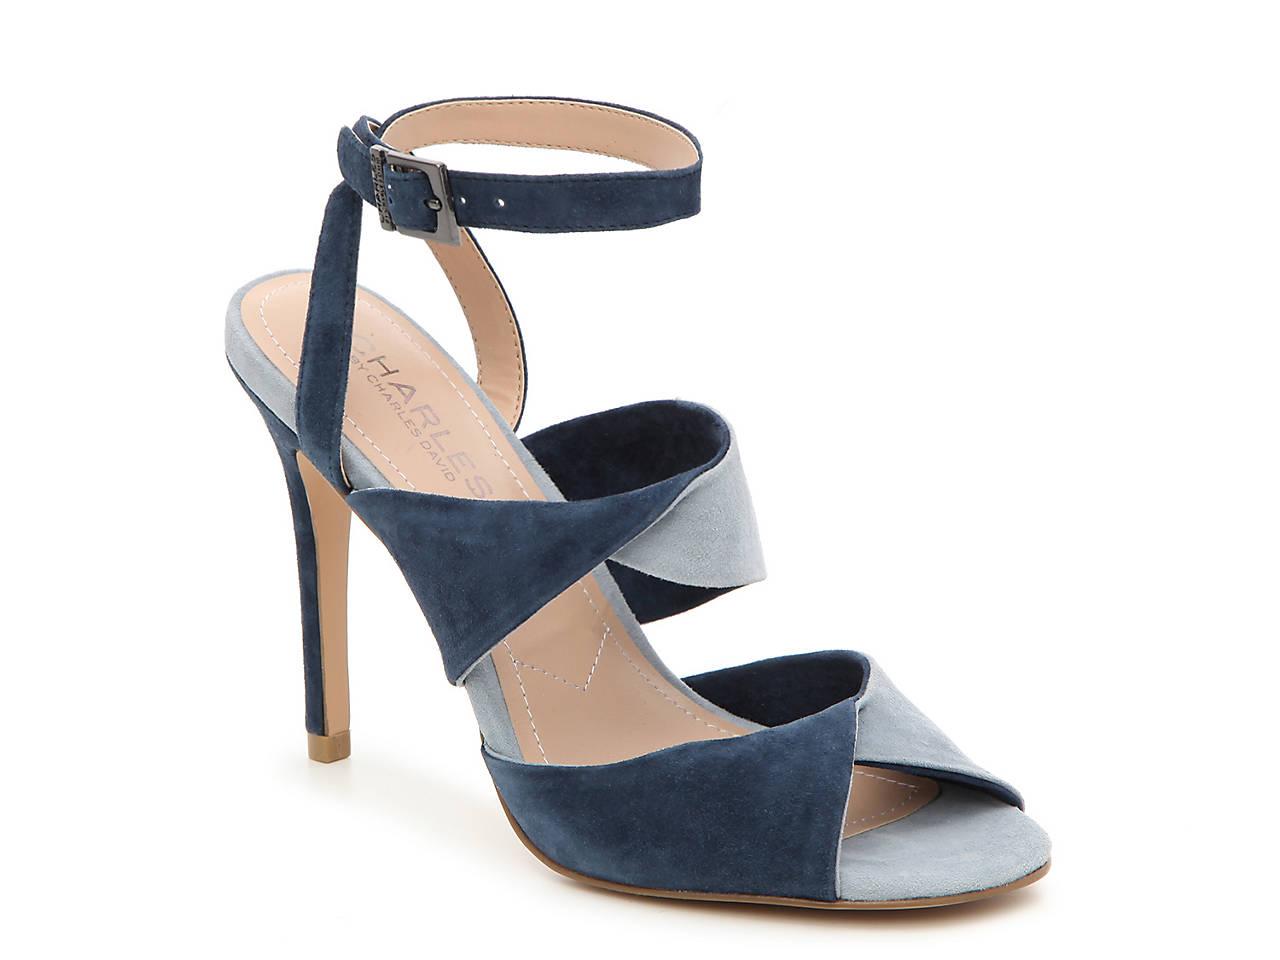 3b6d8179650f Charles by Charles David Radley Sandal Women s Shoes